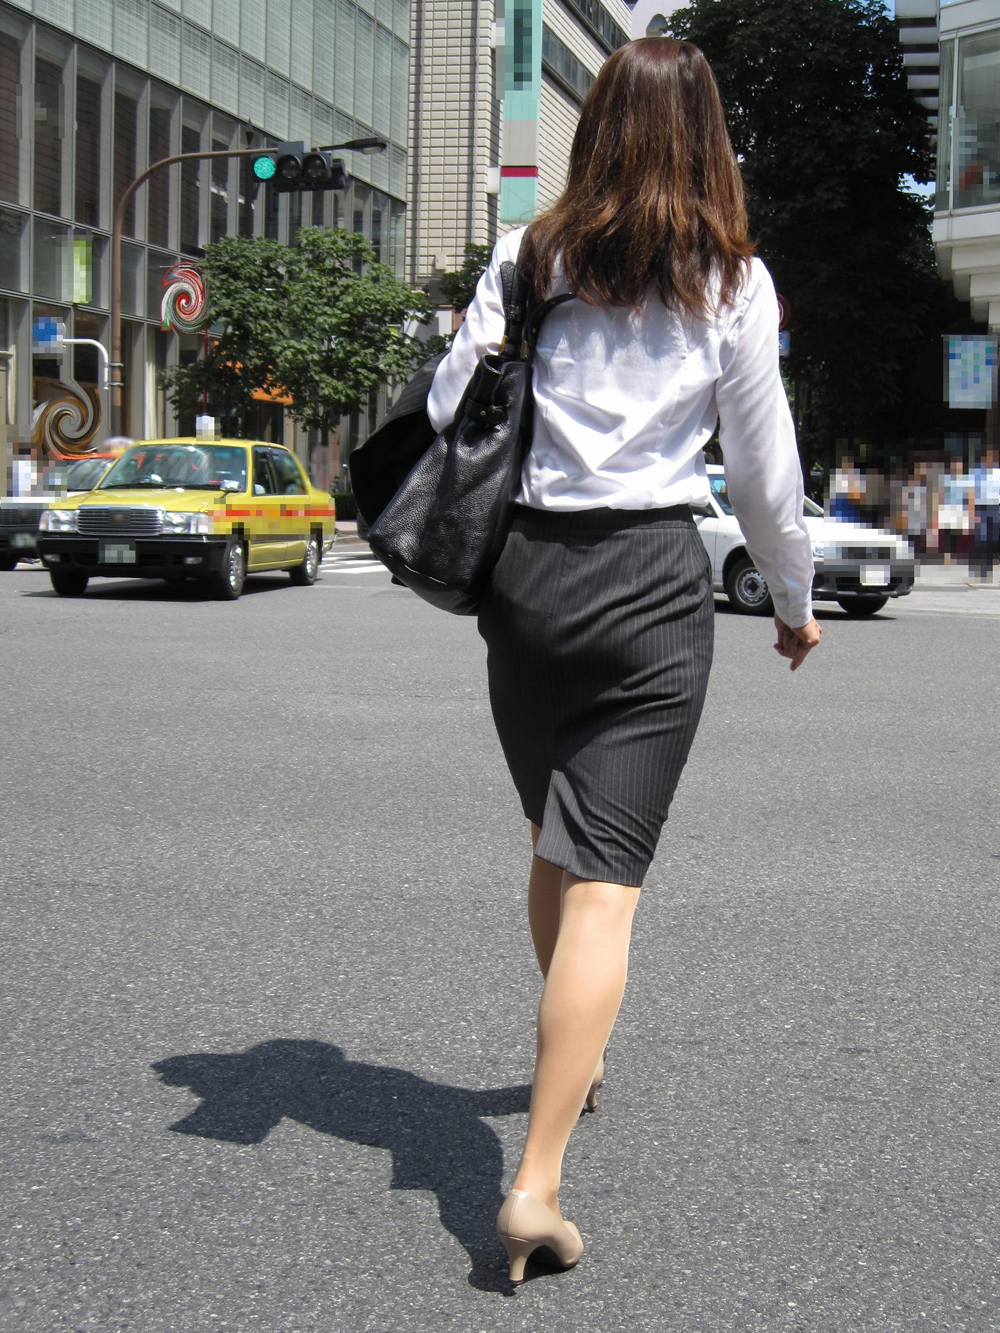 OL ハイソックス 街撮り 【街撮りOLエロ画像】着衣尻と美脚を只管追っかけ!肉付き